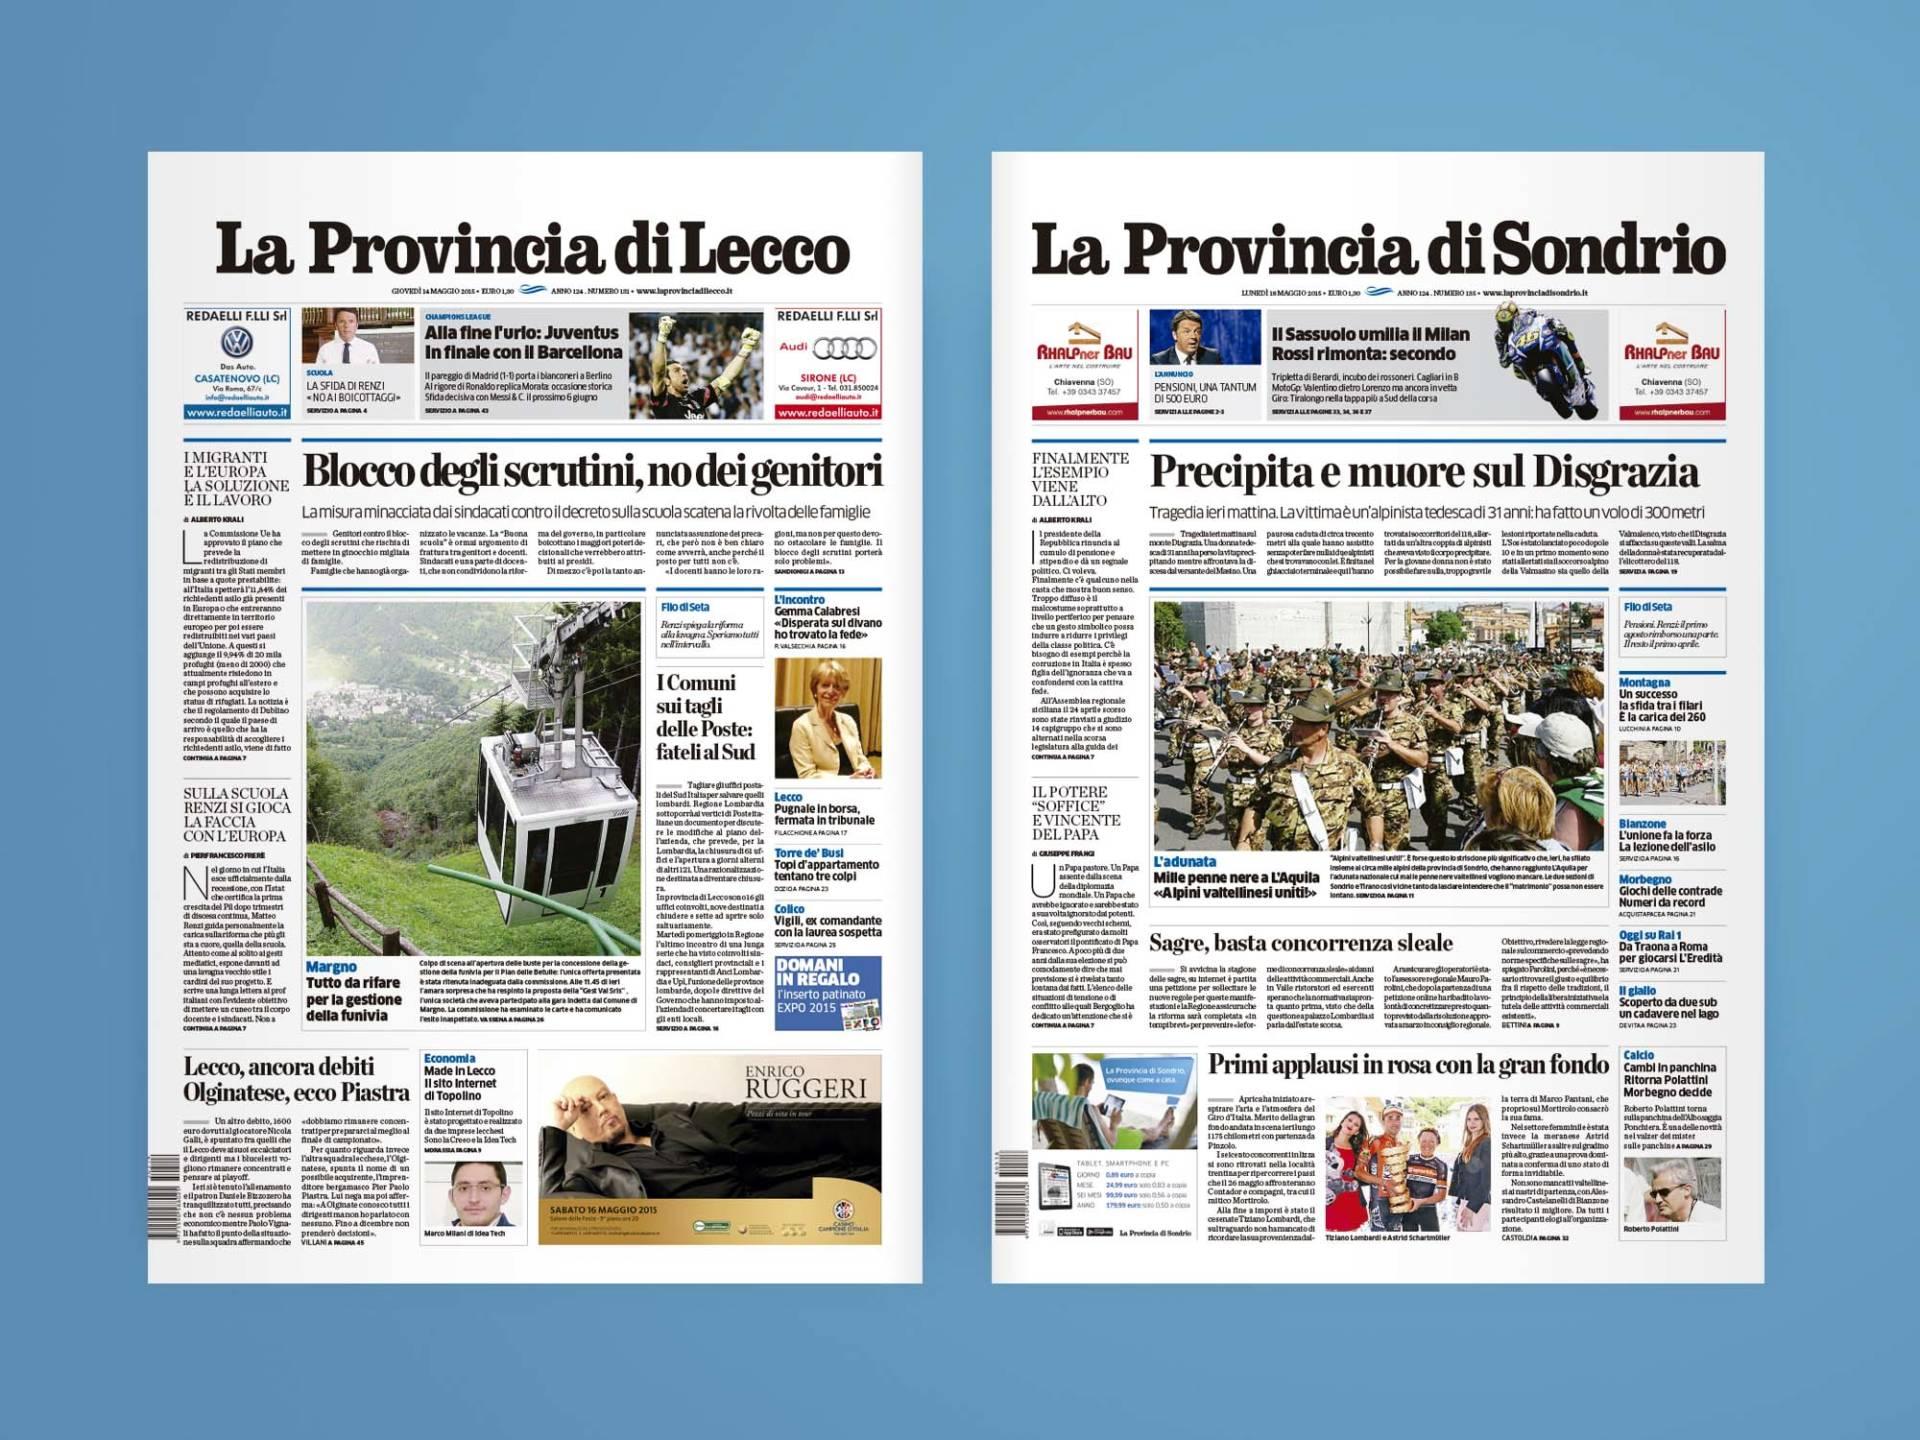 La_Provincia_02_Wenceslau_News_Design